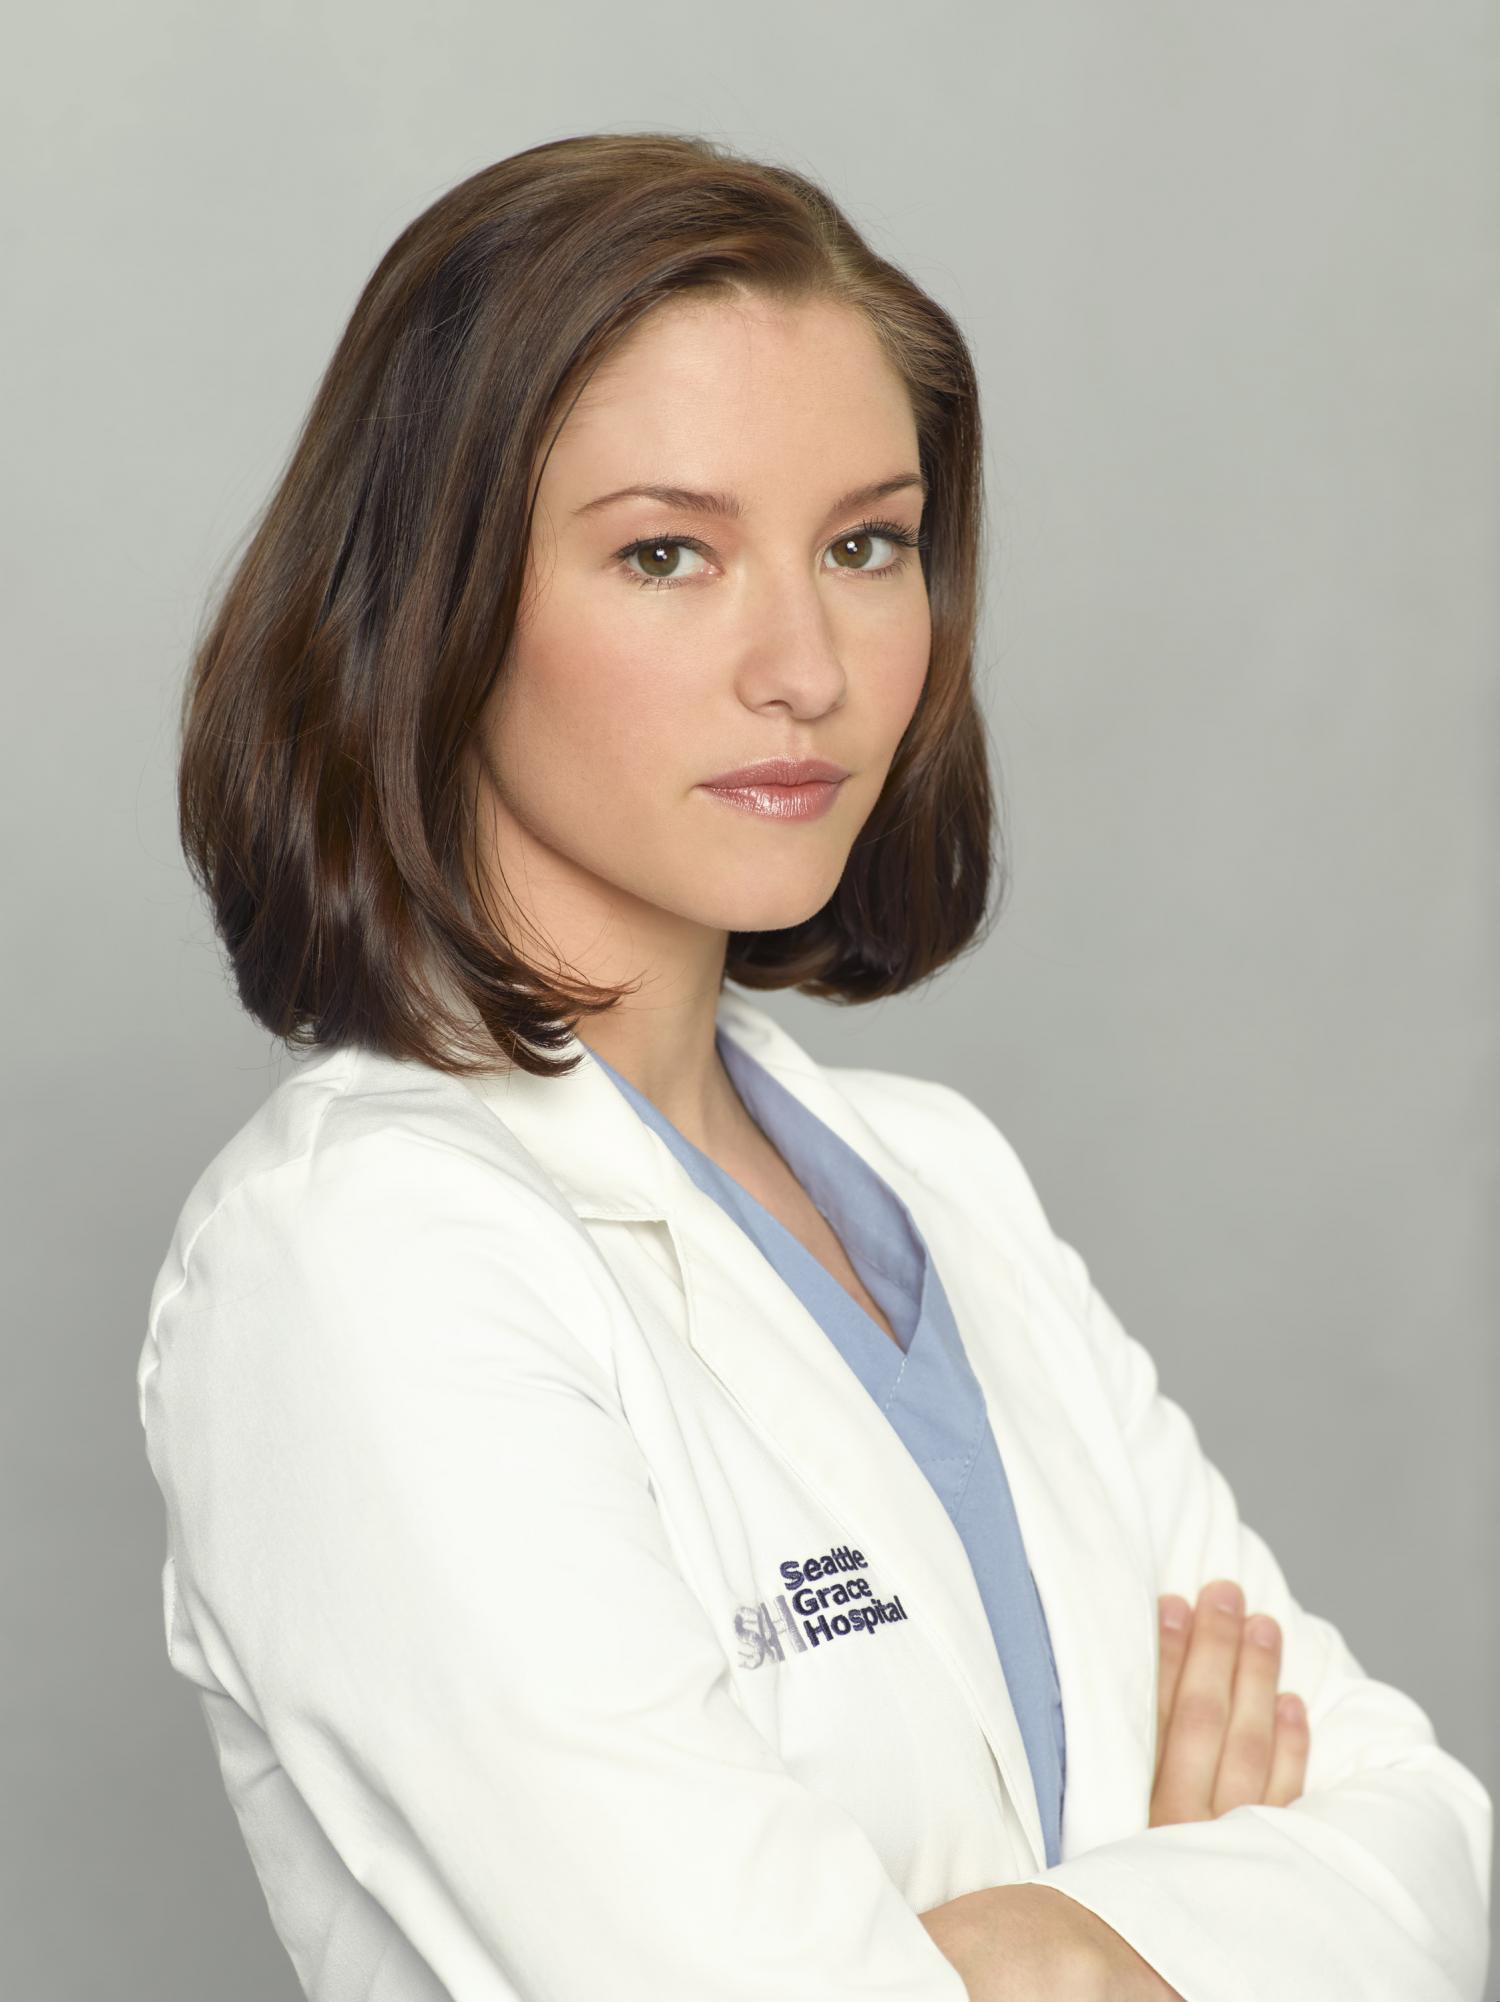 GreyS Anatomy Lexie